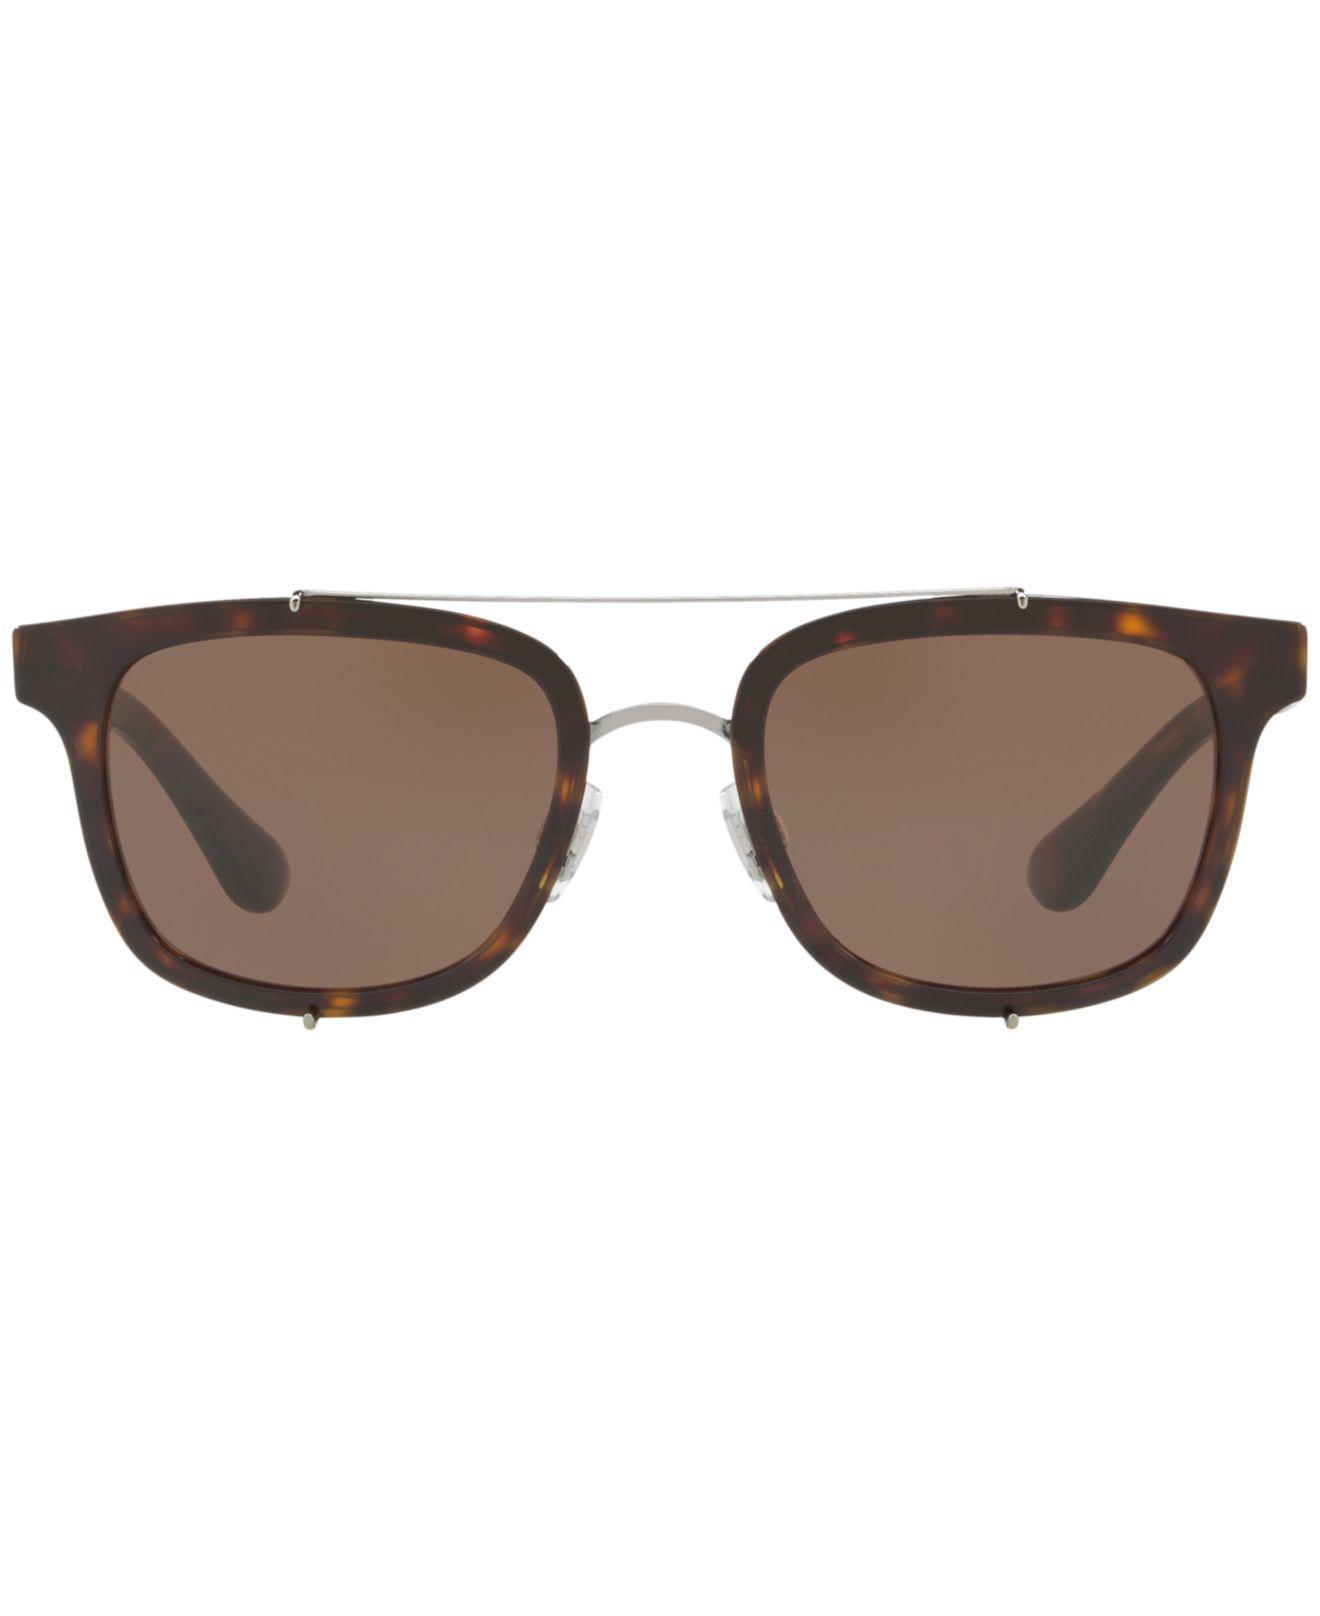 744dc695d613 Lyst - Dolce   Gabbana Sunglasses